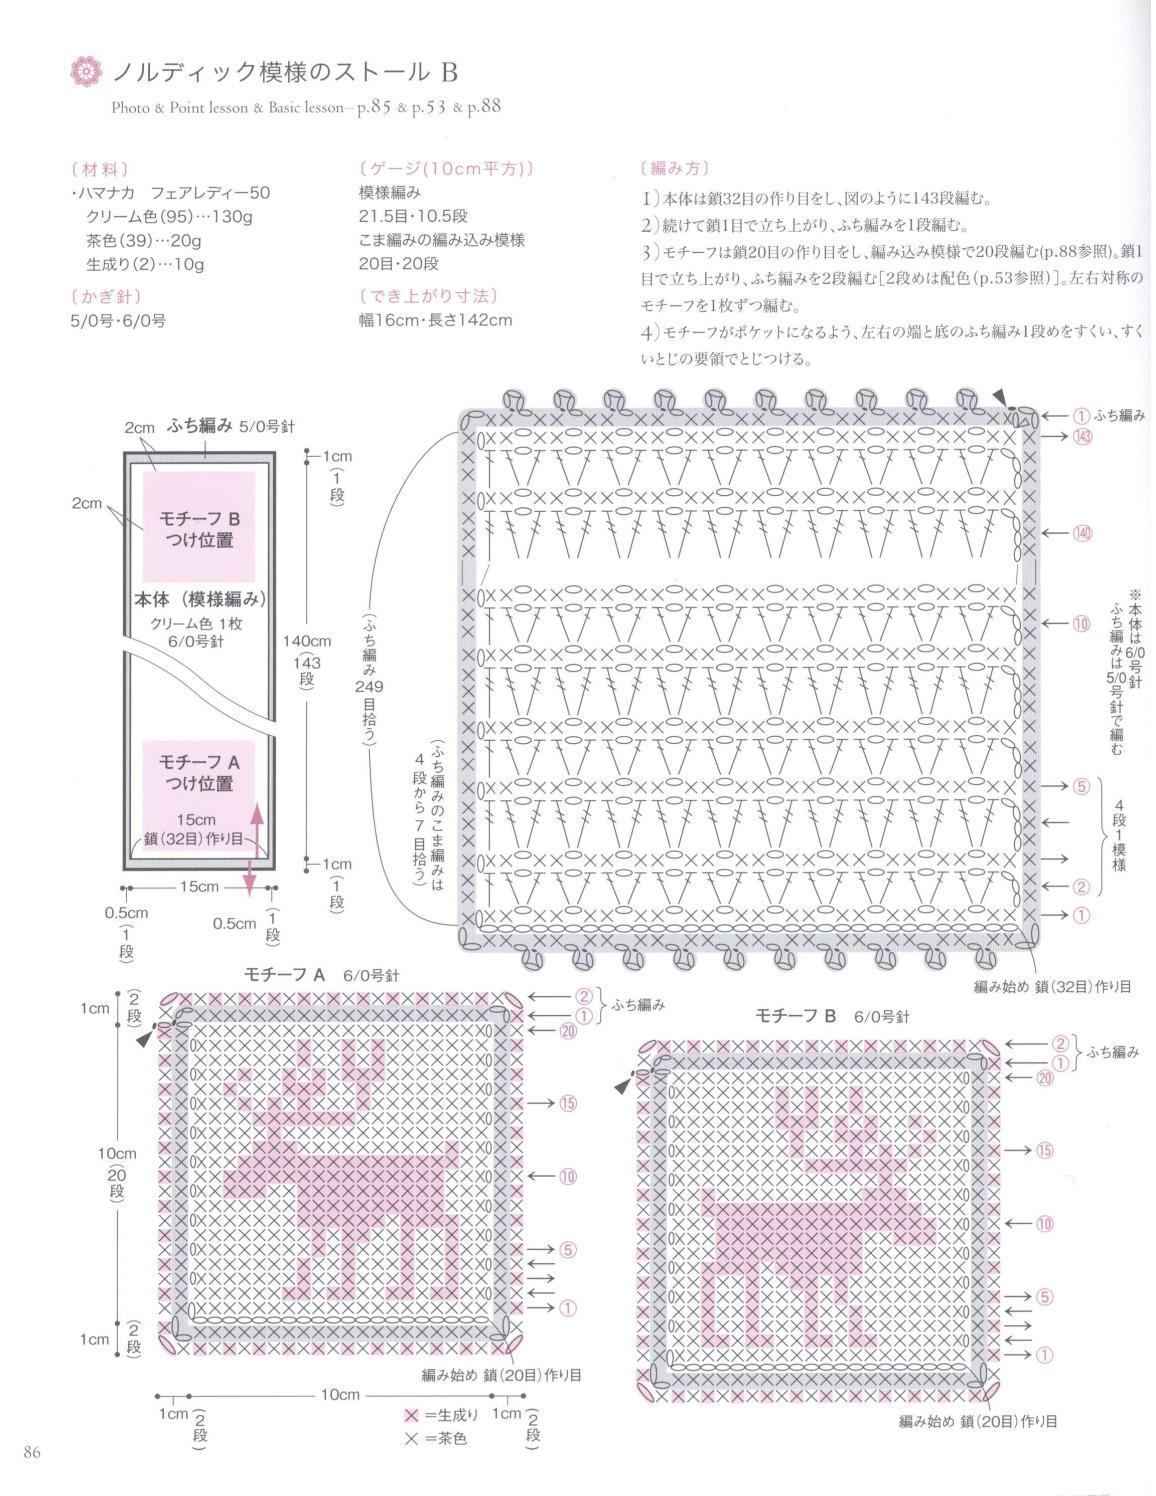 Asahi original crochet best selection 2012 page 86